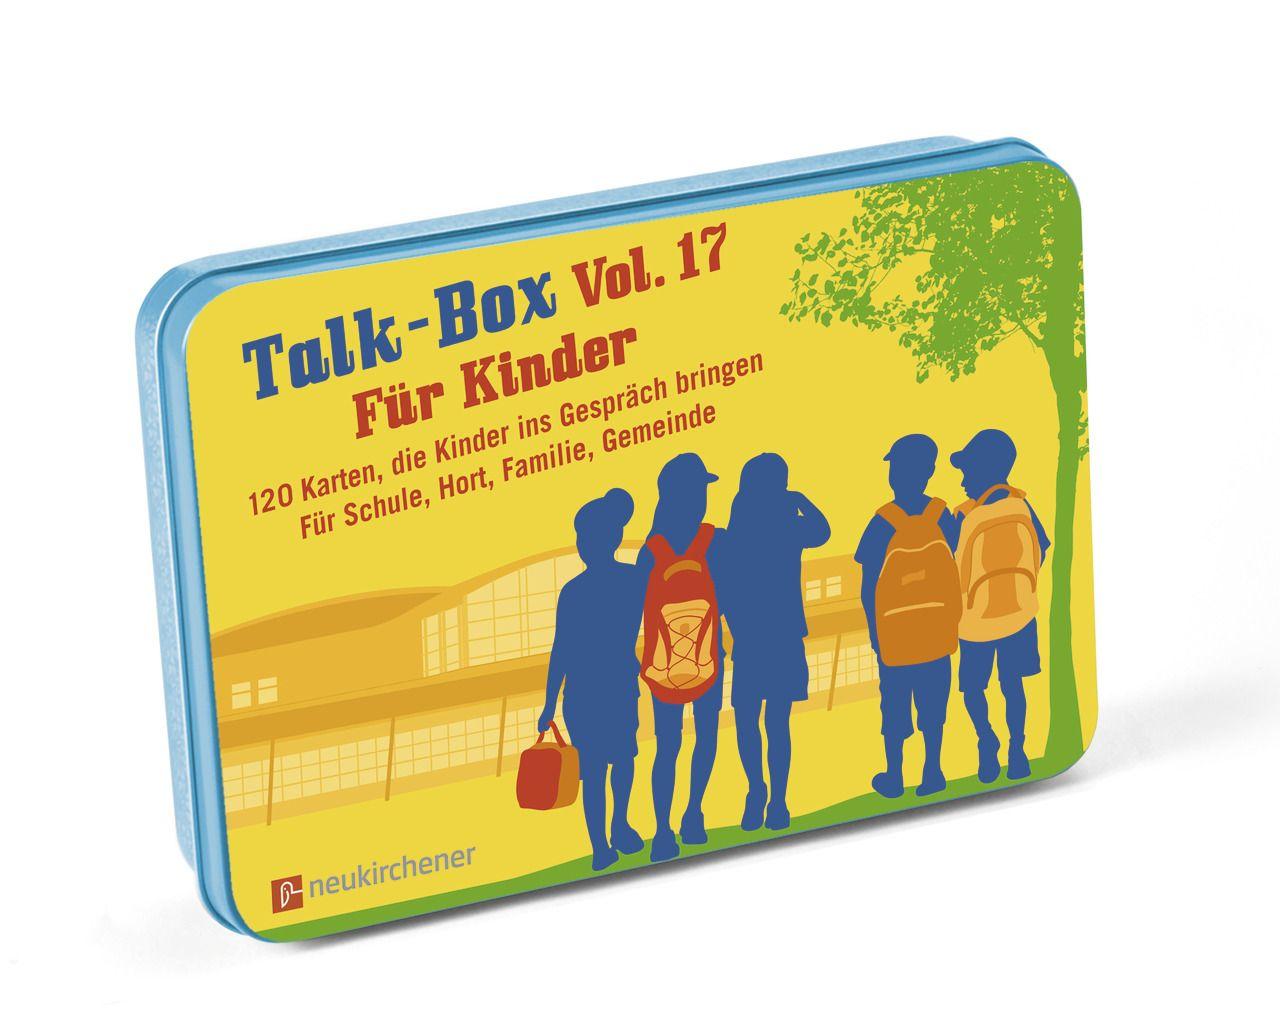 Abbildung Talk Box für Kinder